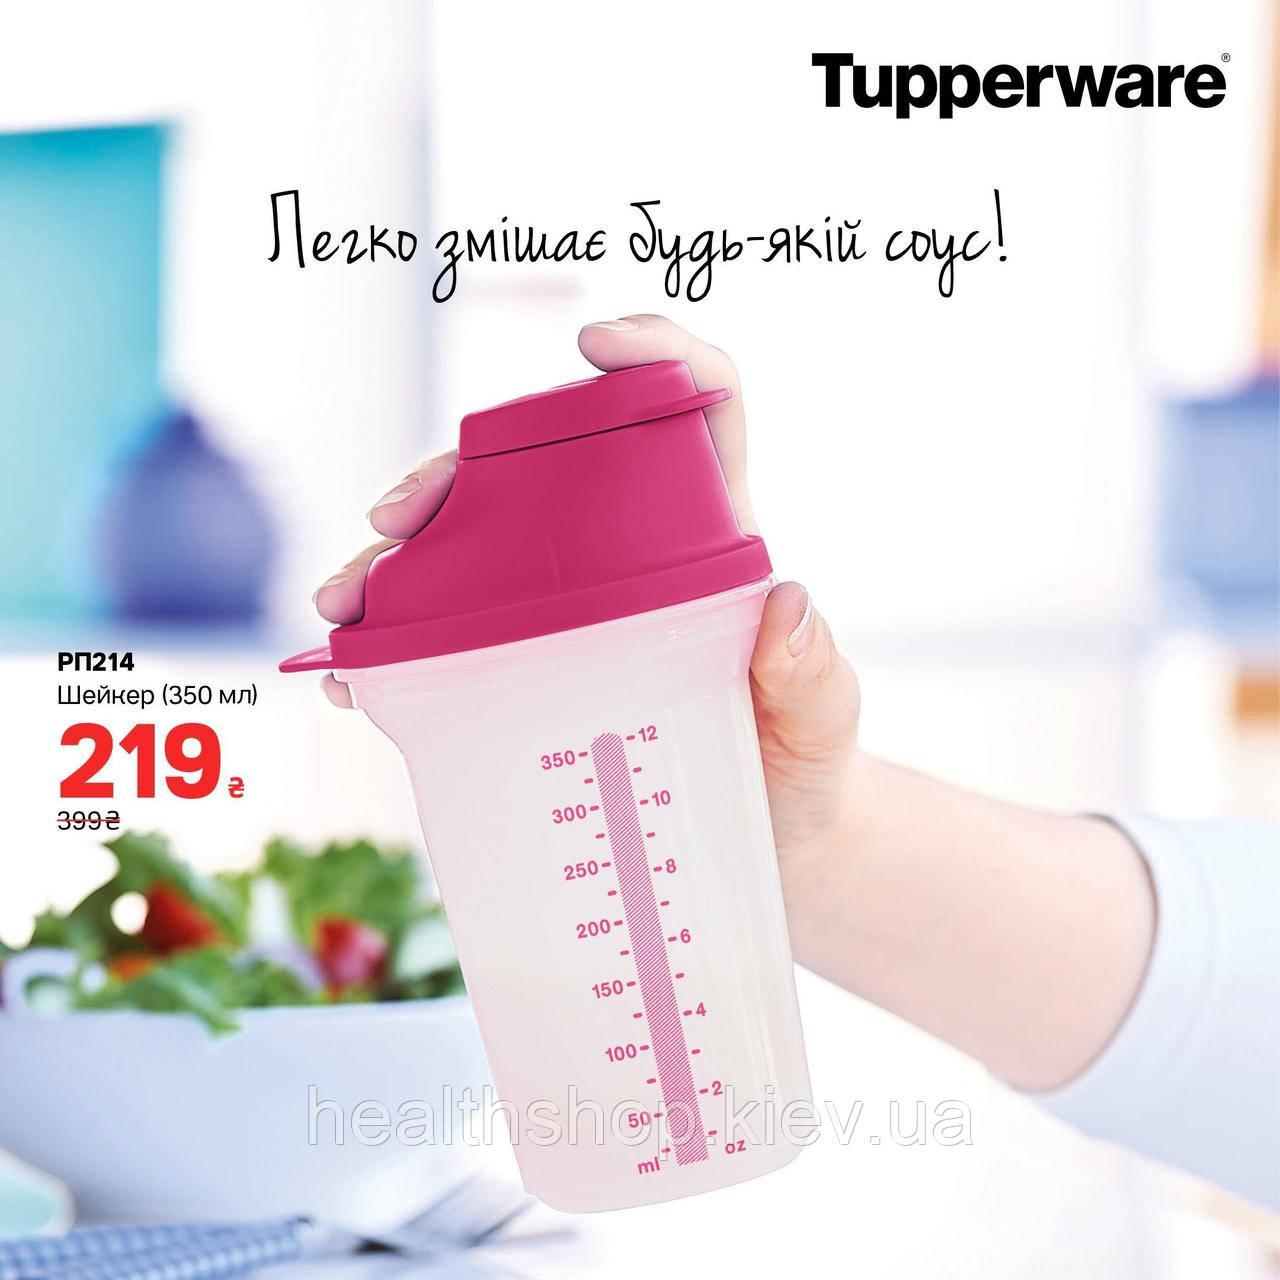 Мини-шейкер (350 мл) розовая крышка Tupperware (Оригинал) Тапервер